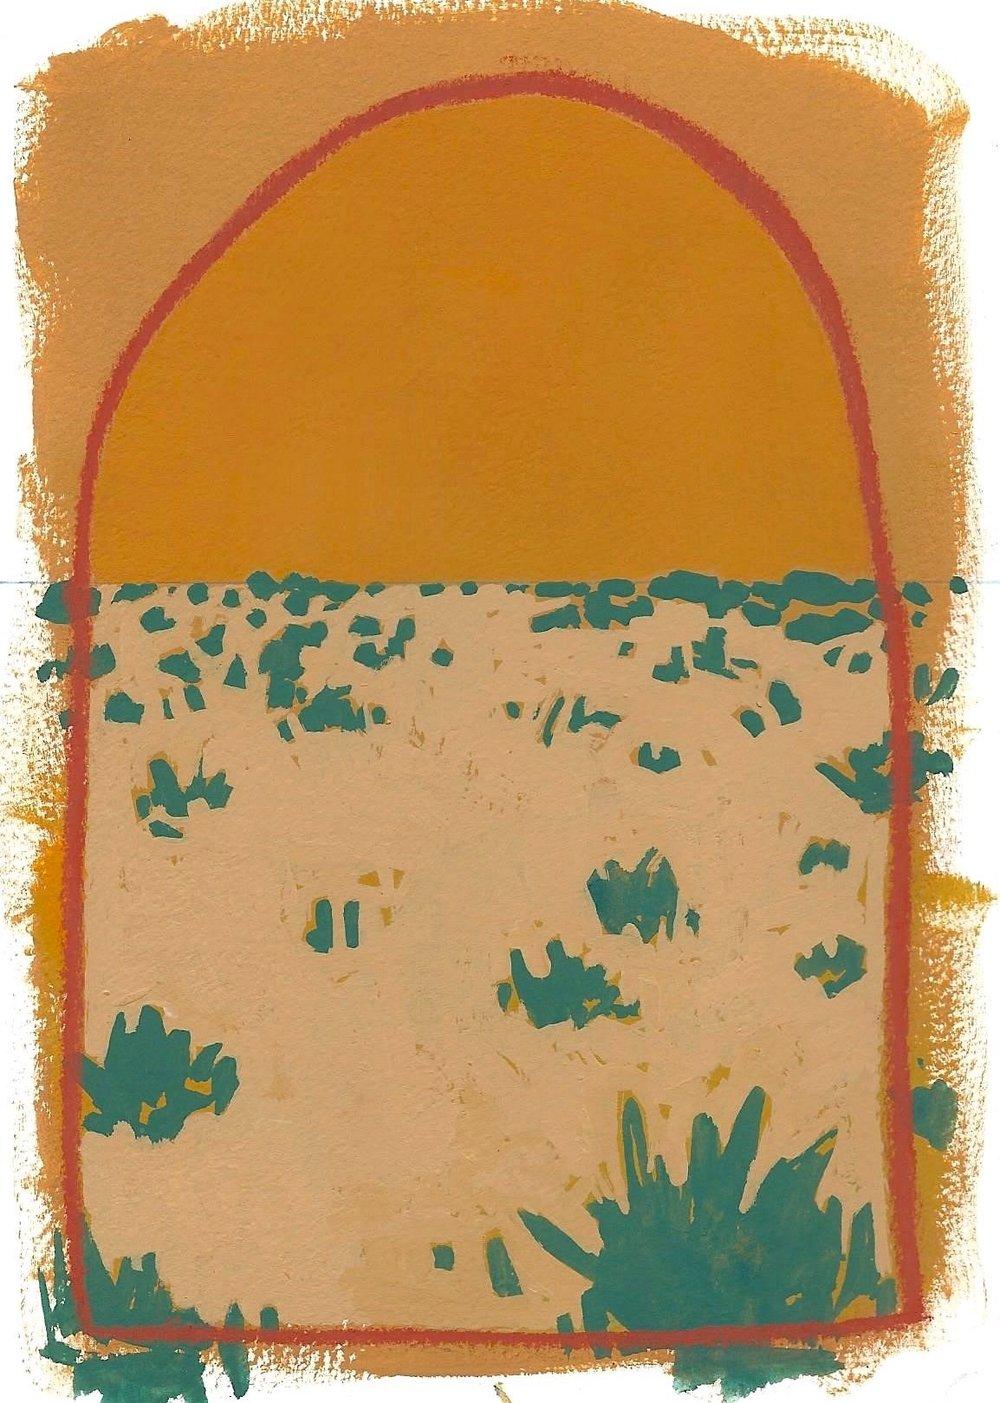 #03 Mini Desert Painting: Bumblebees